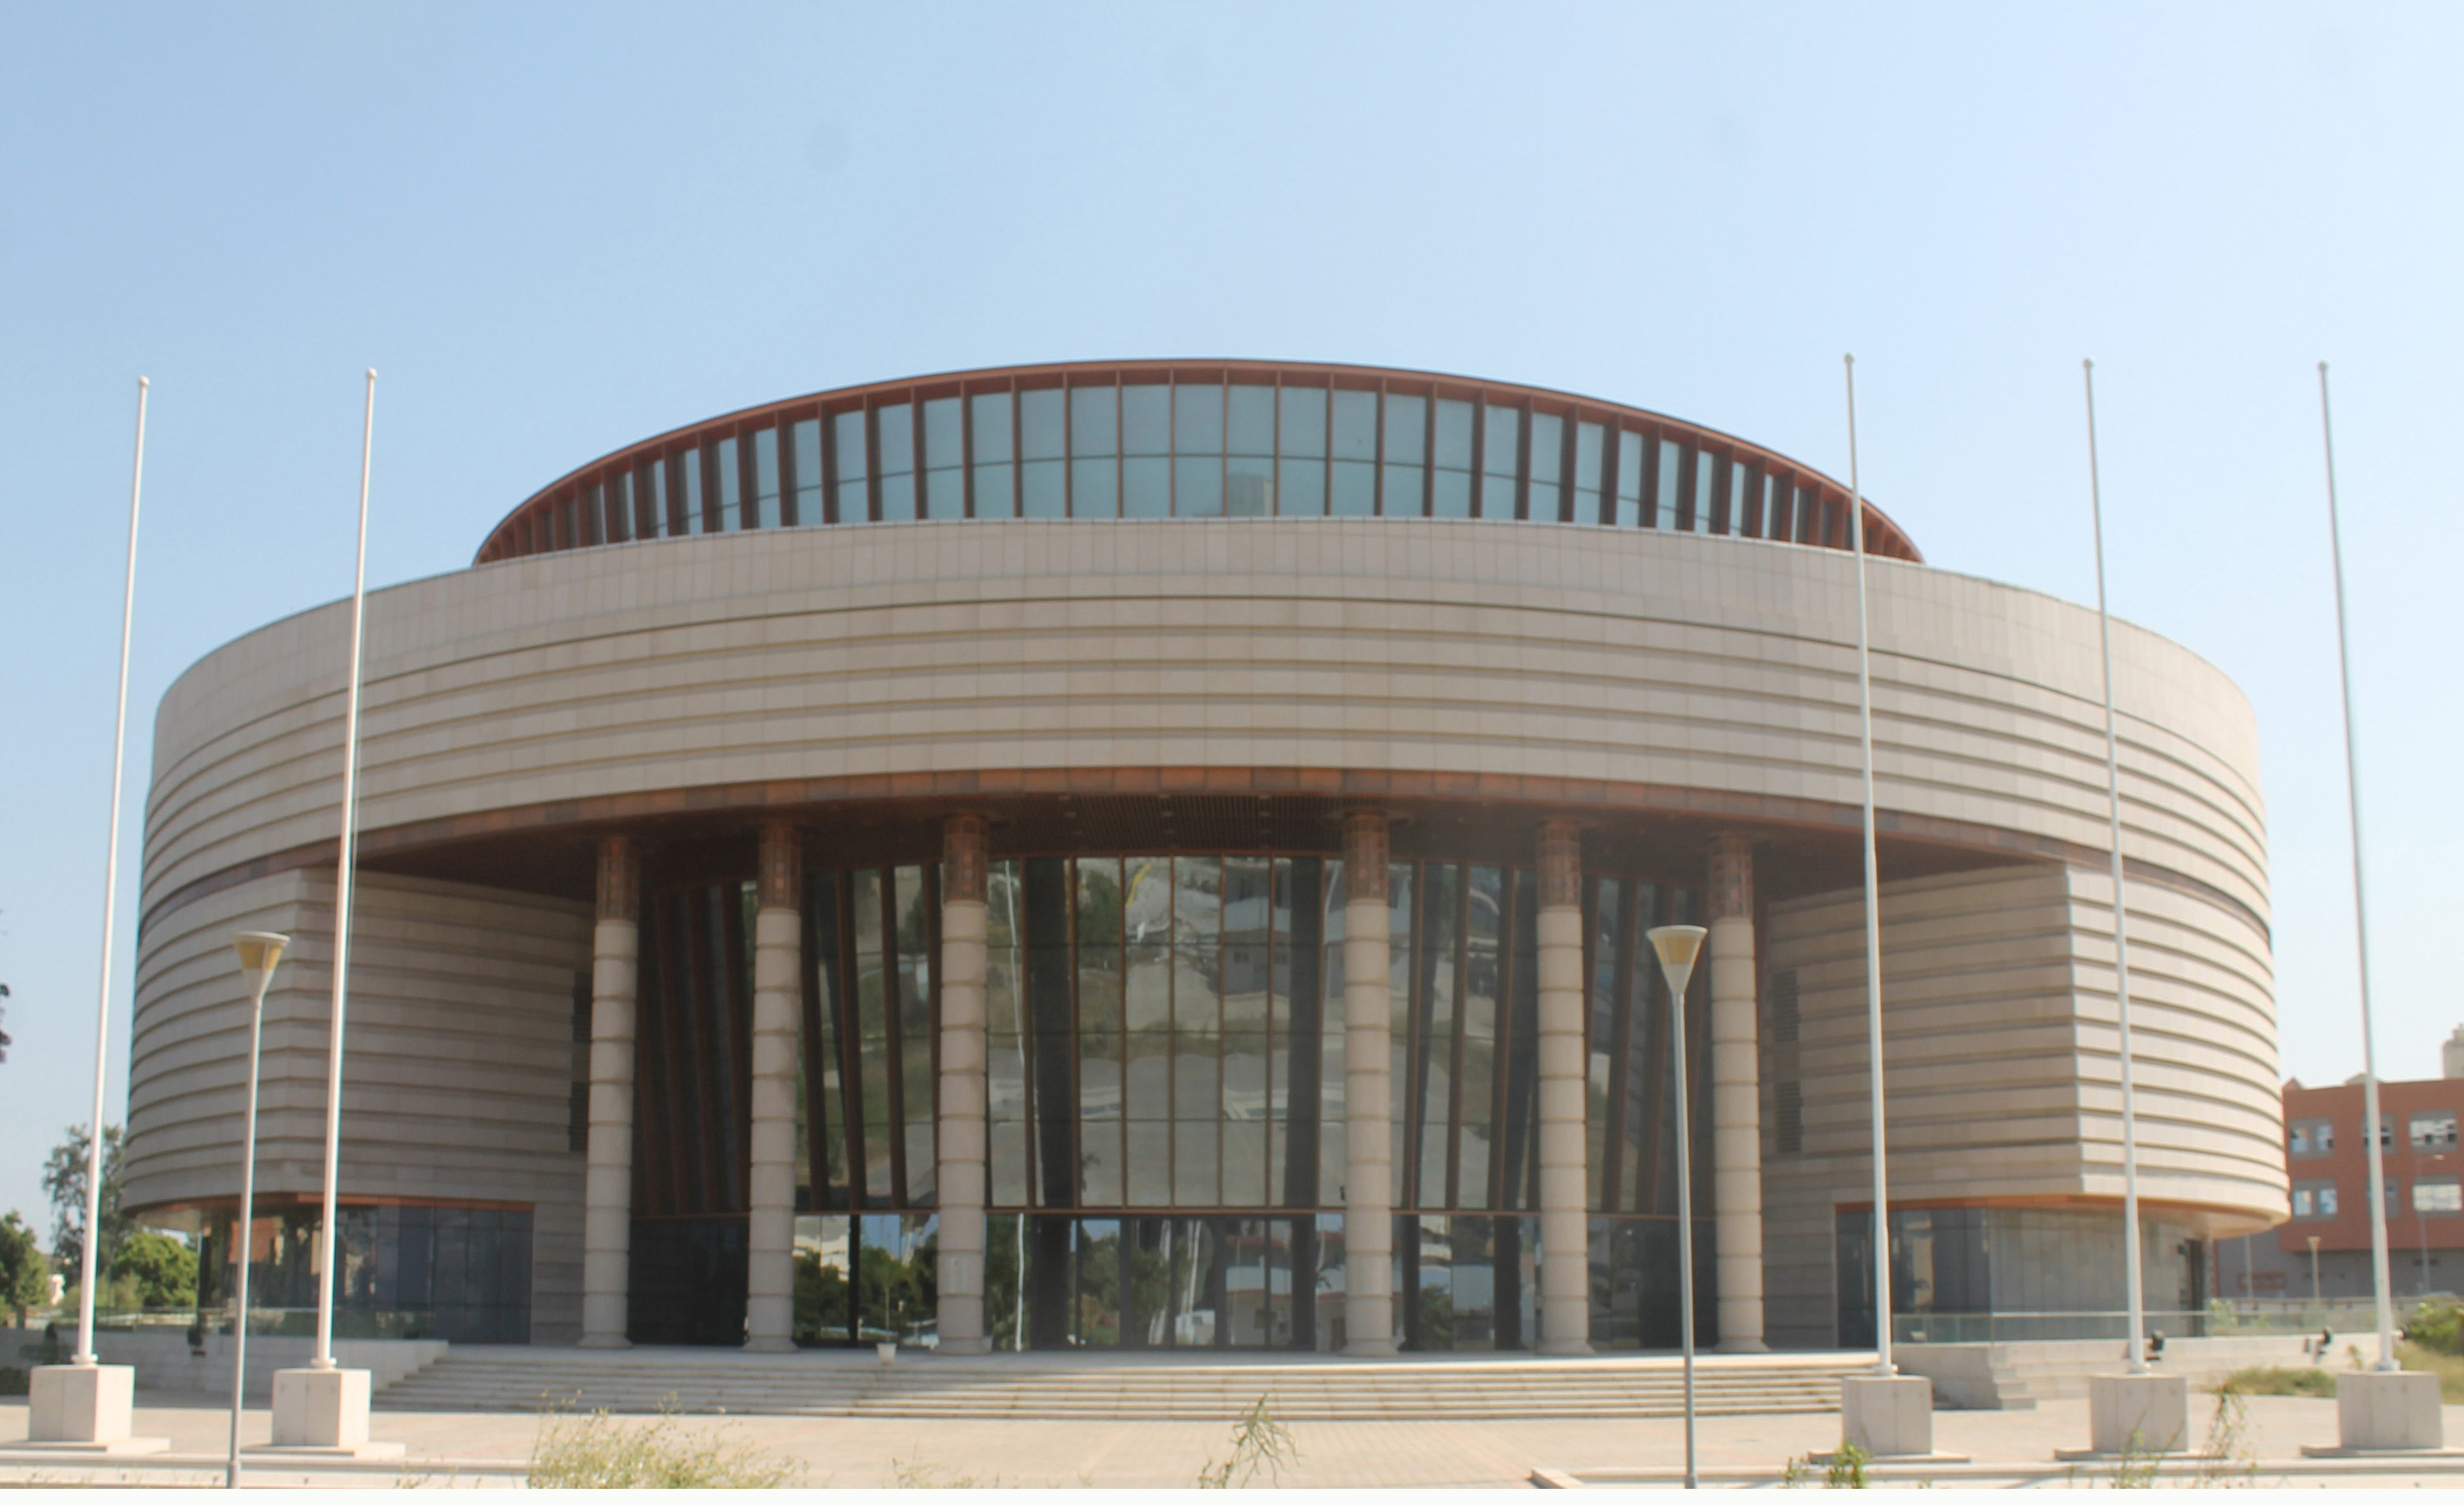 Exterior, Museum of Black Civilisations, Dakar. (Photo courtesy of the Museum of Black Civilisations)